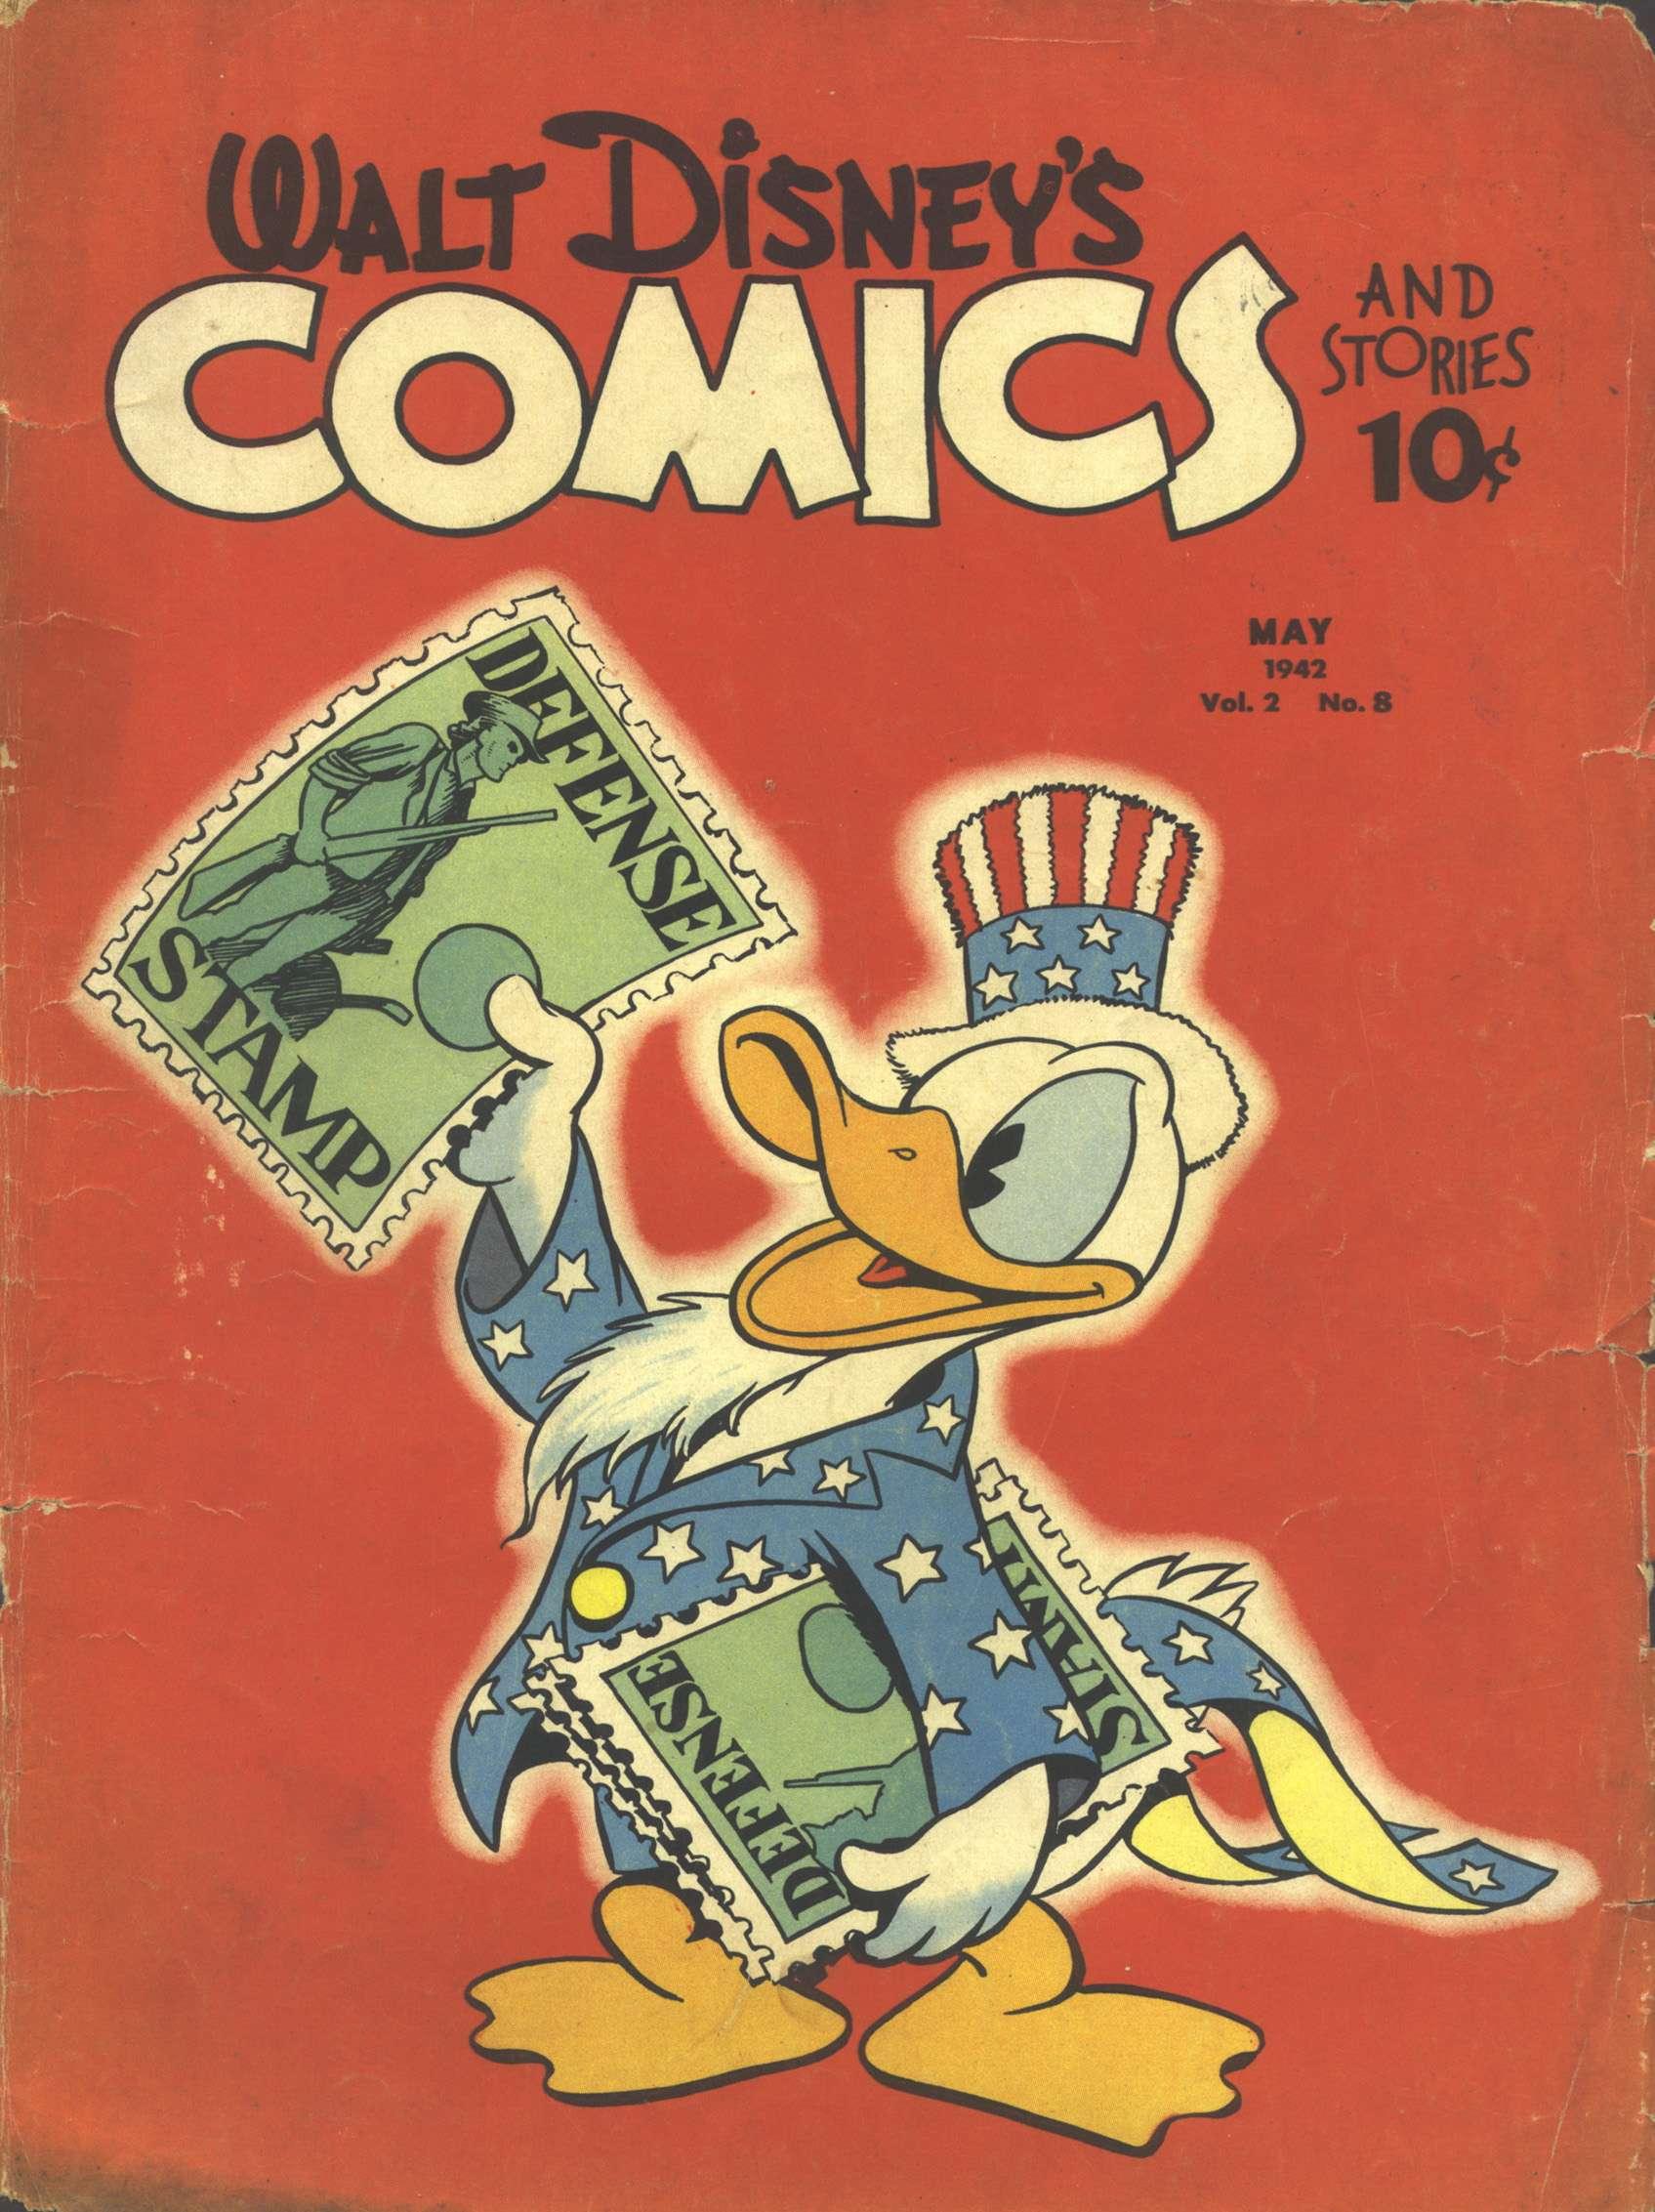 Walt Disneys Comics and Stories 20 Page 1